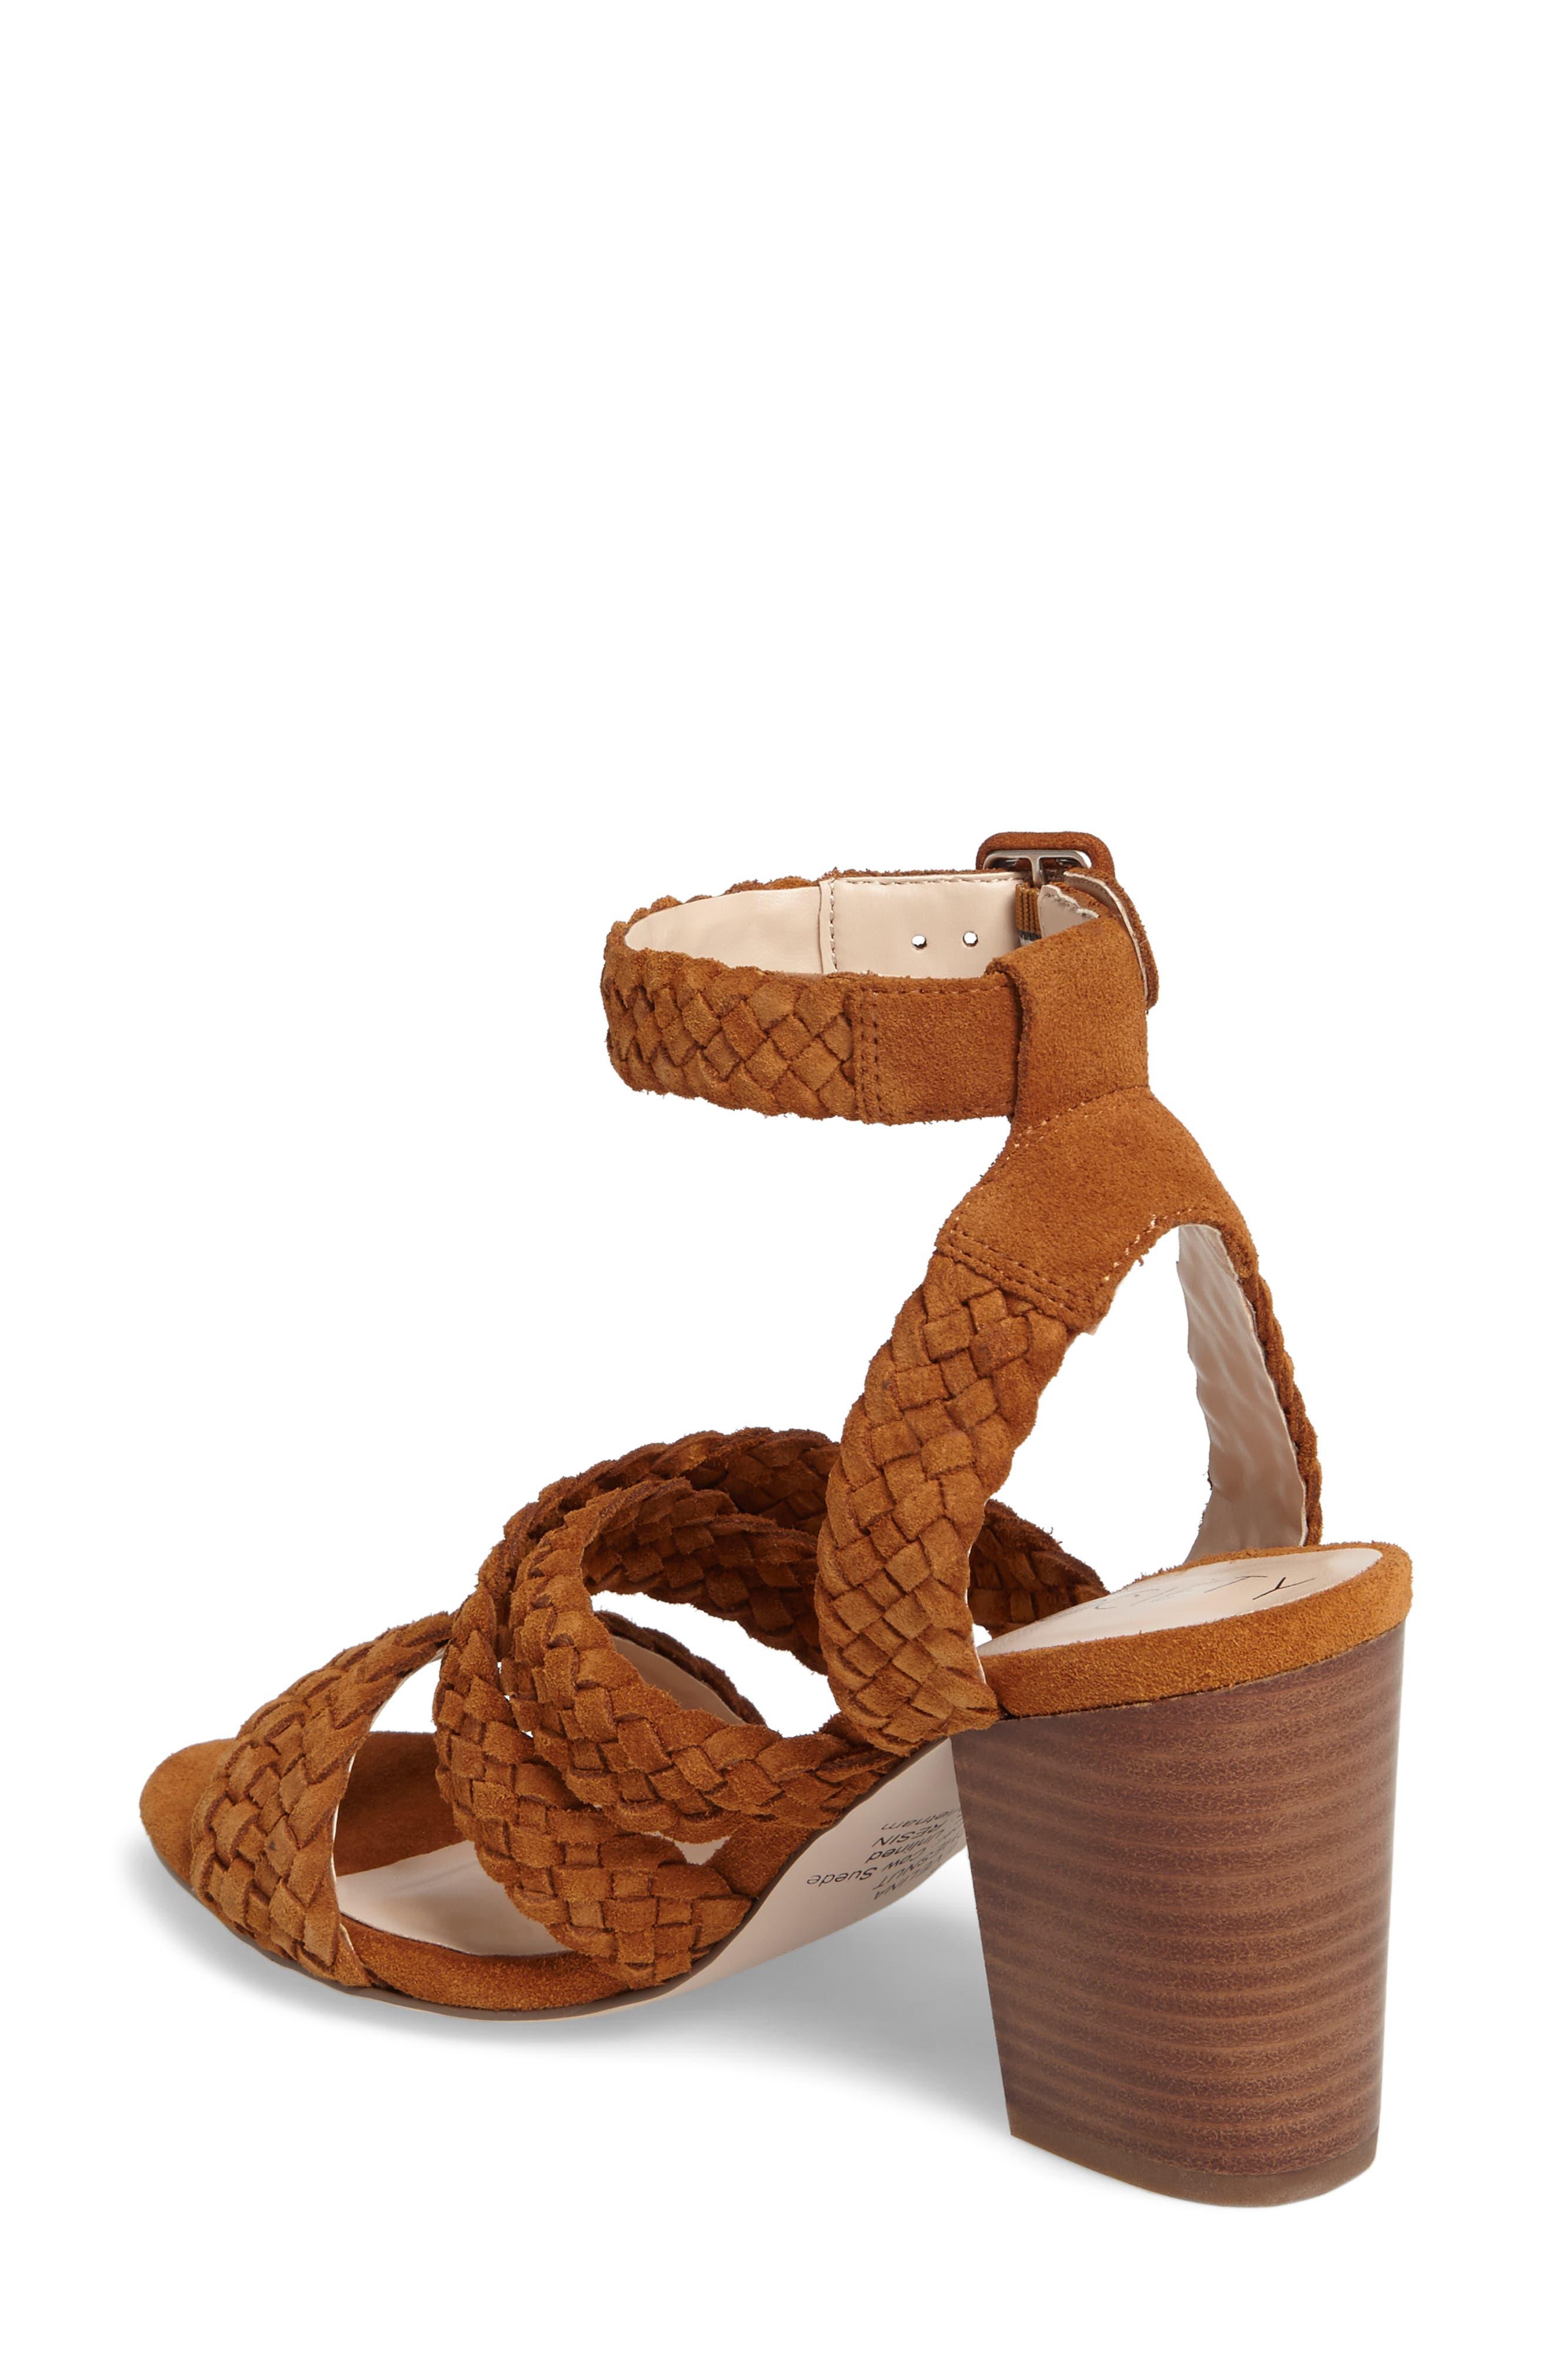 Evelina Block Heel Sandal,                             Alternate thumbnail 2, color,                             Chestnut